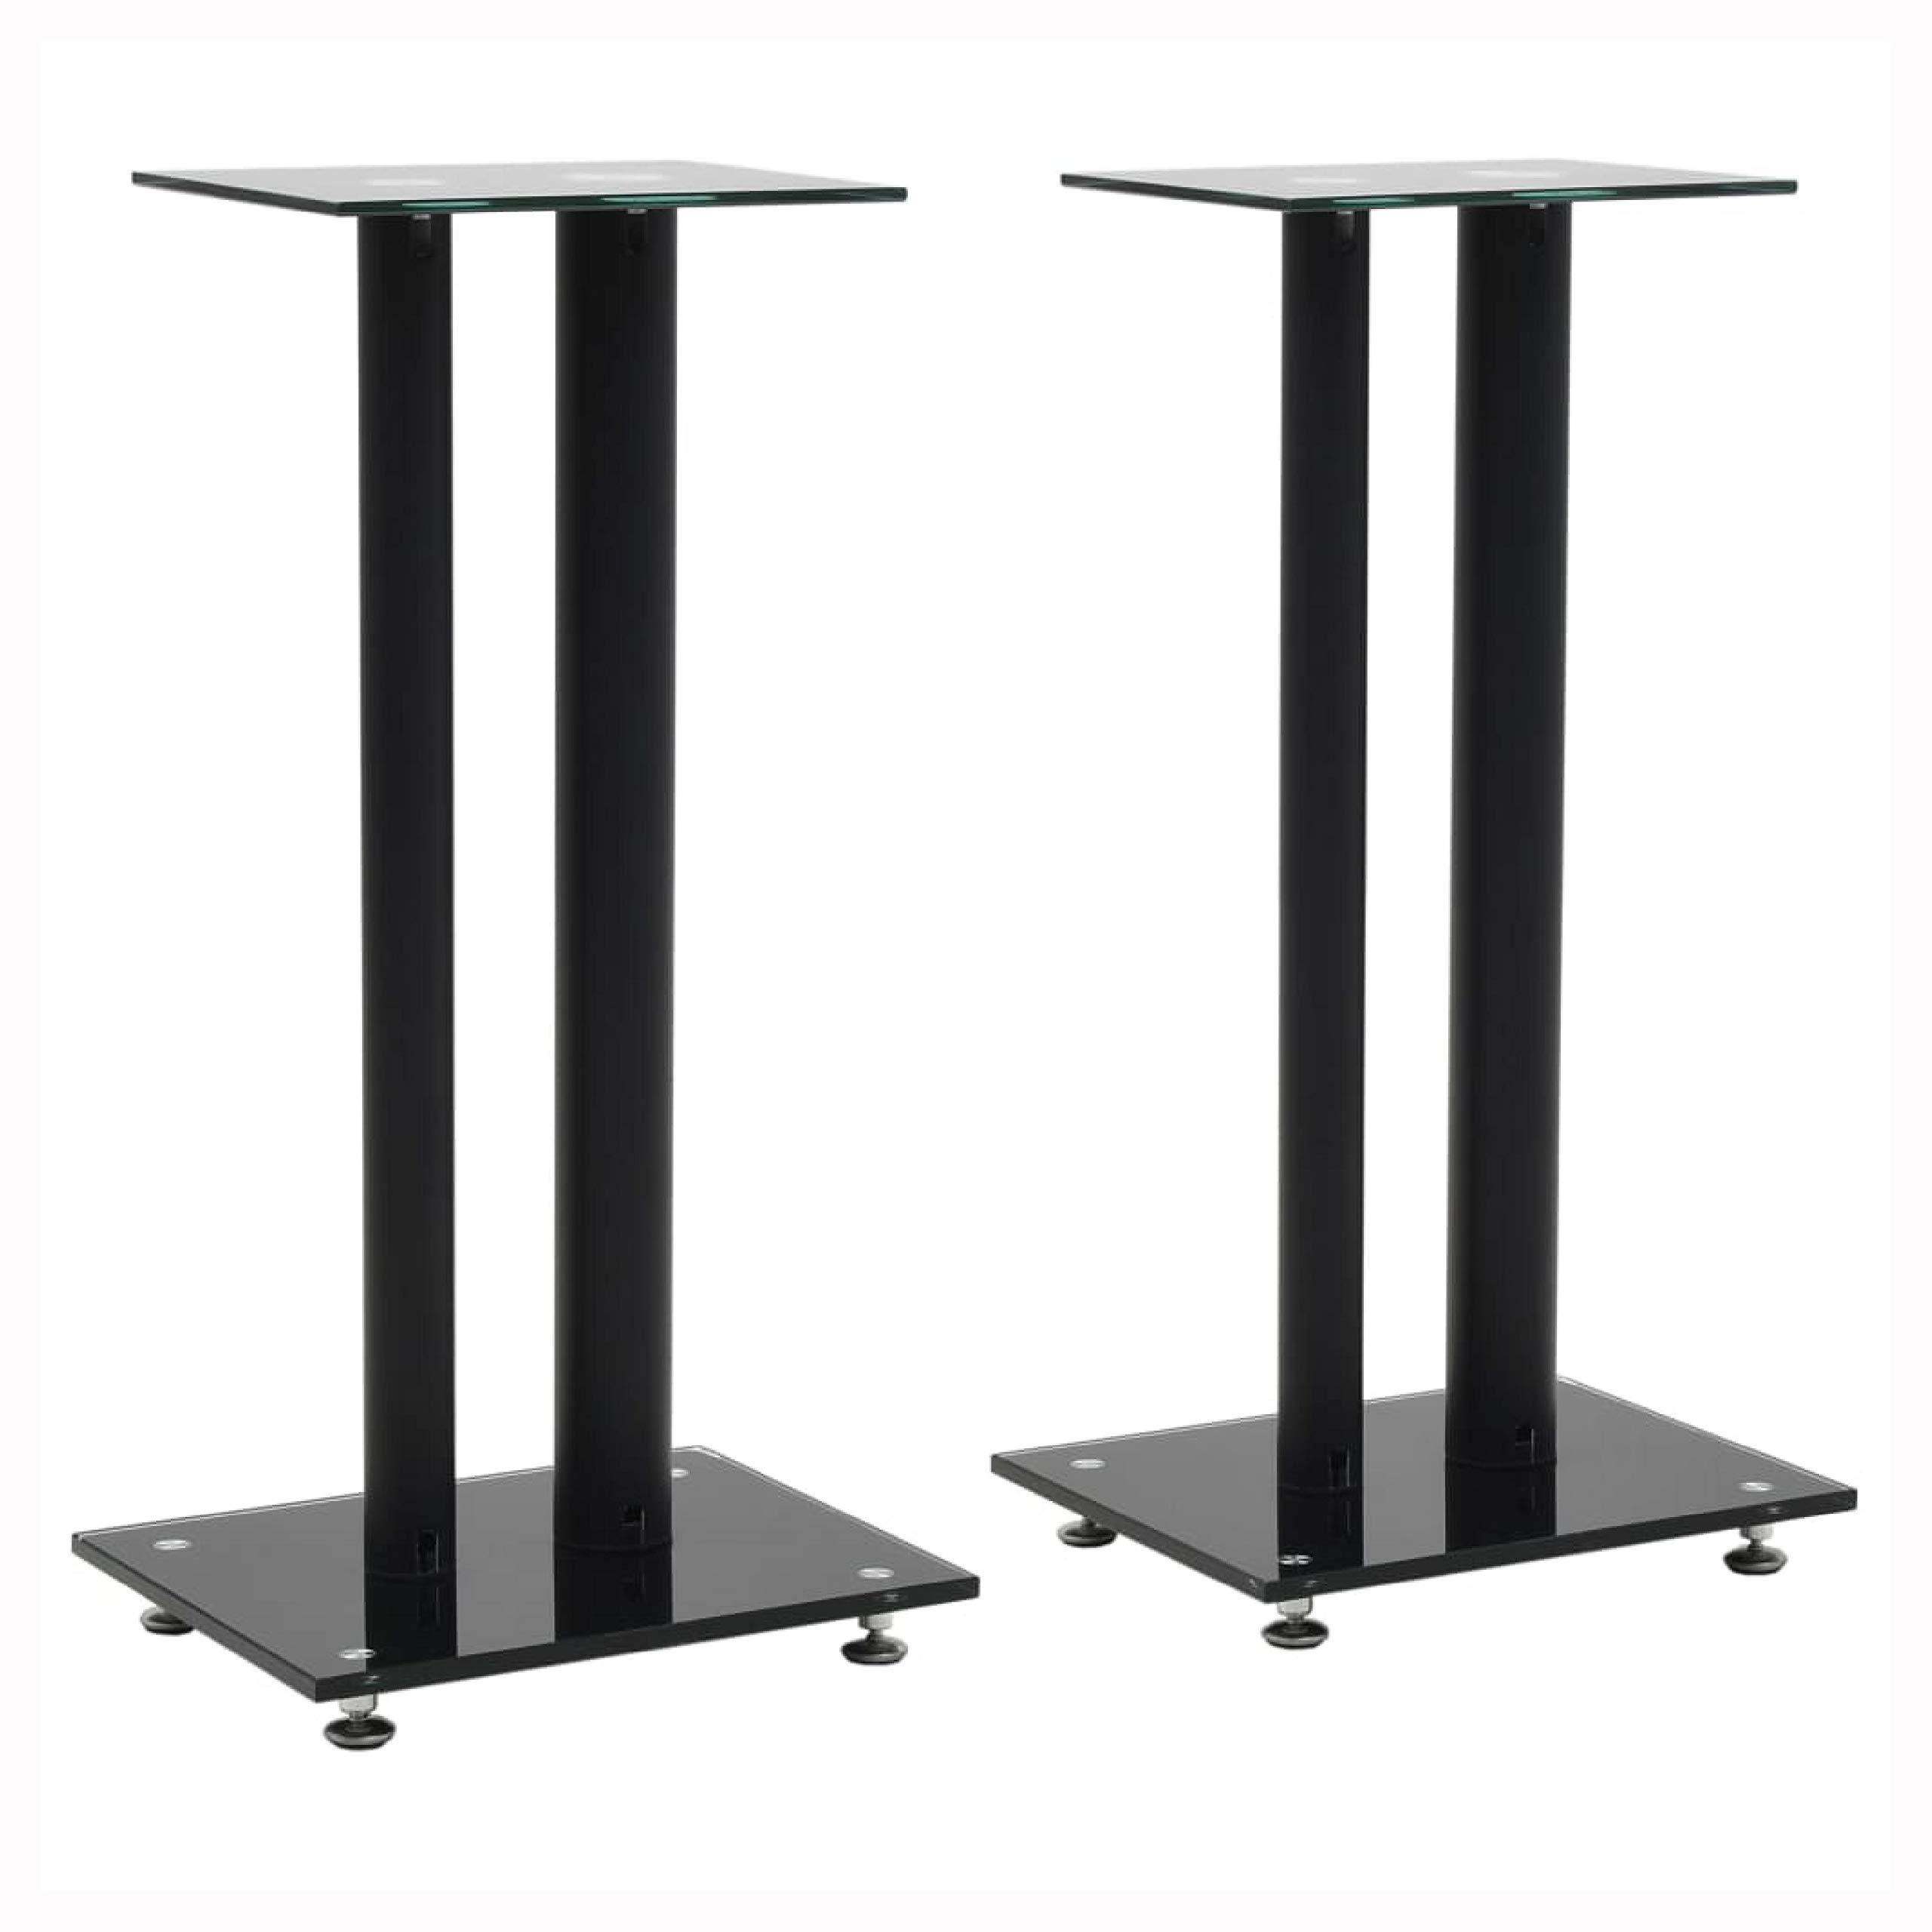 HomyDelight Speaker Stand & Mount, Speaker Stands 2 pcs Tempered Glass 2 Pillars Design Black by HomyDelight